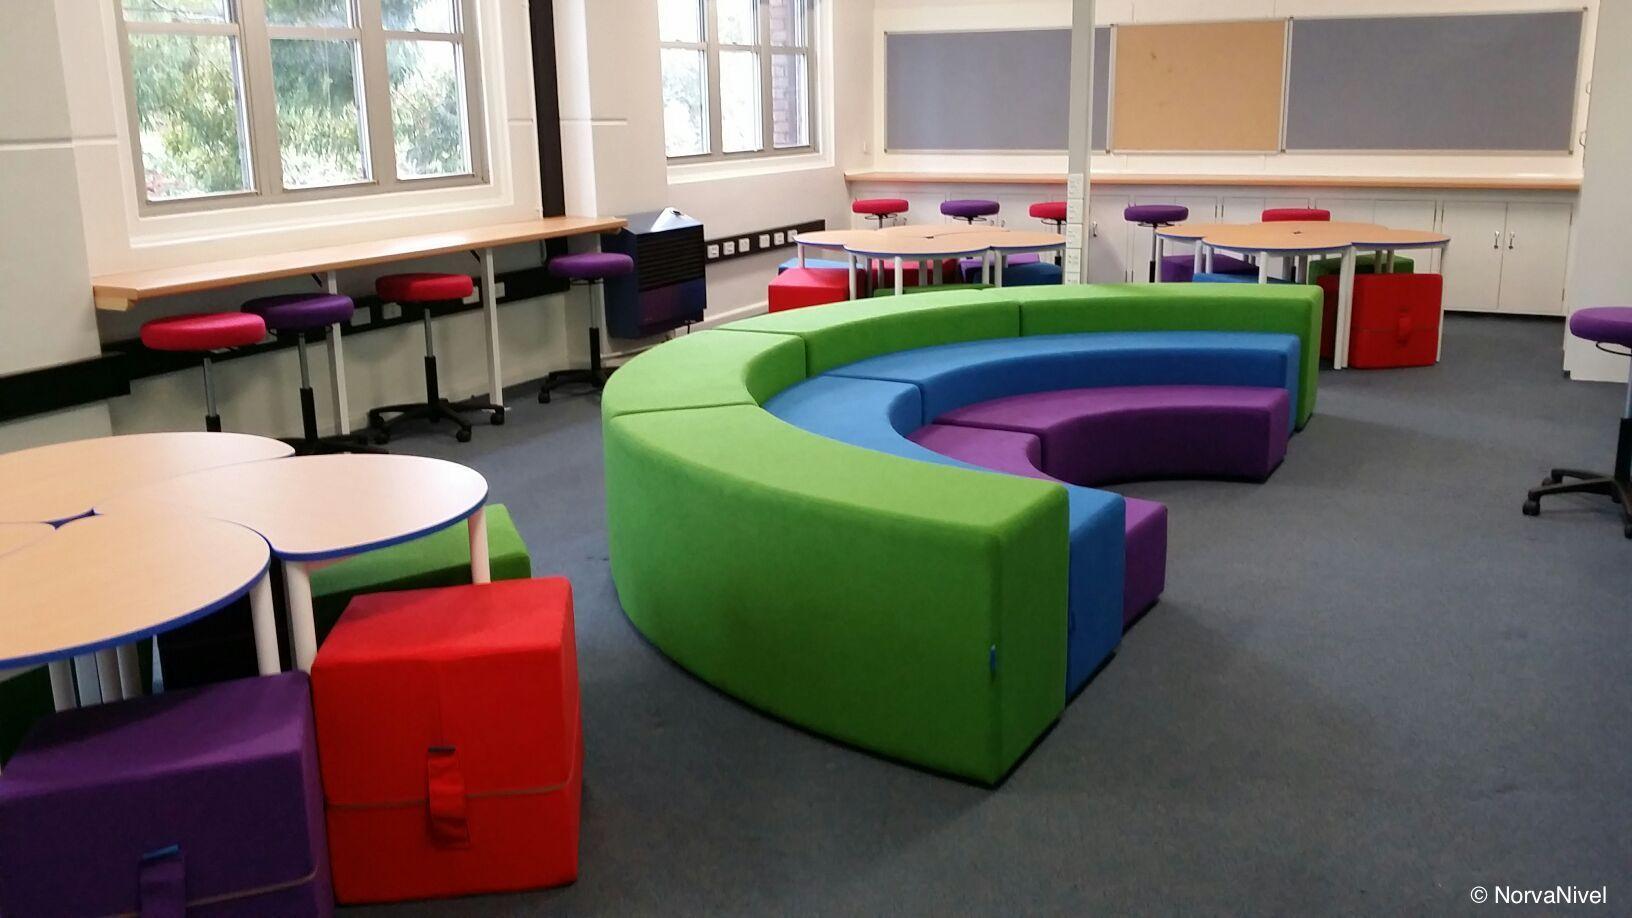 Pin On Next Generation Classrooms